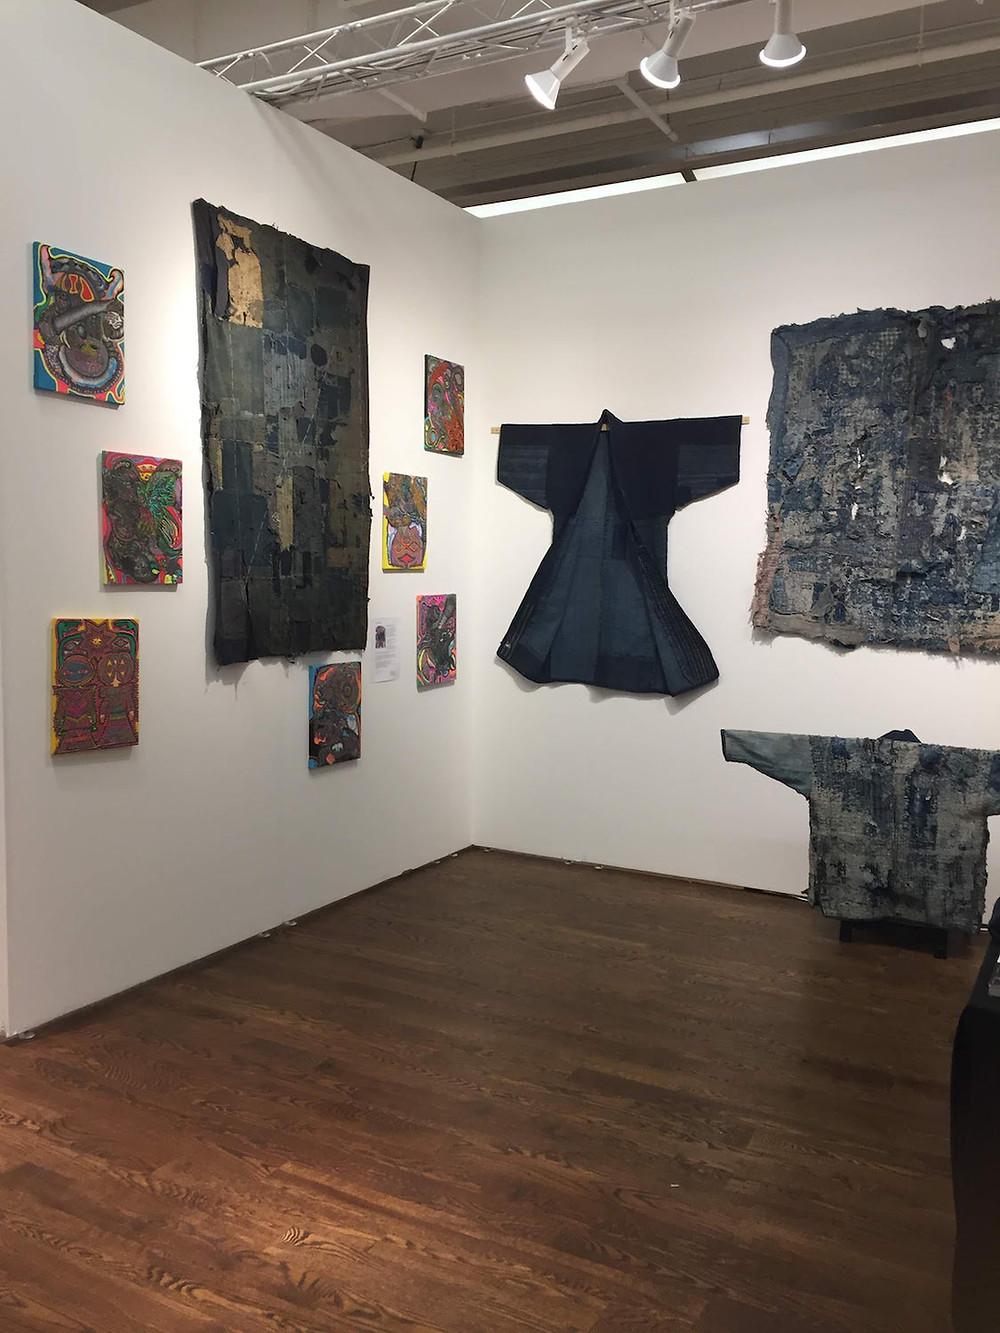 Atusko Barouh's booth, Outsider Art Fair 2019, New York